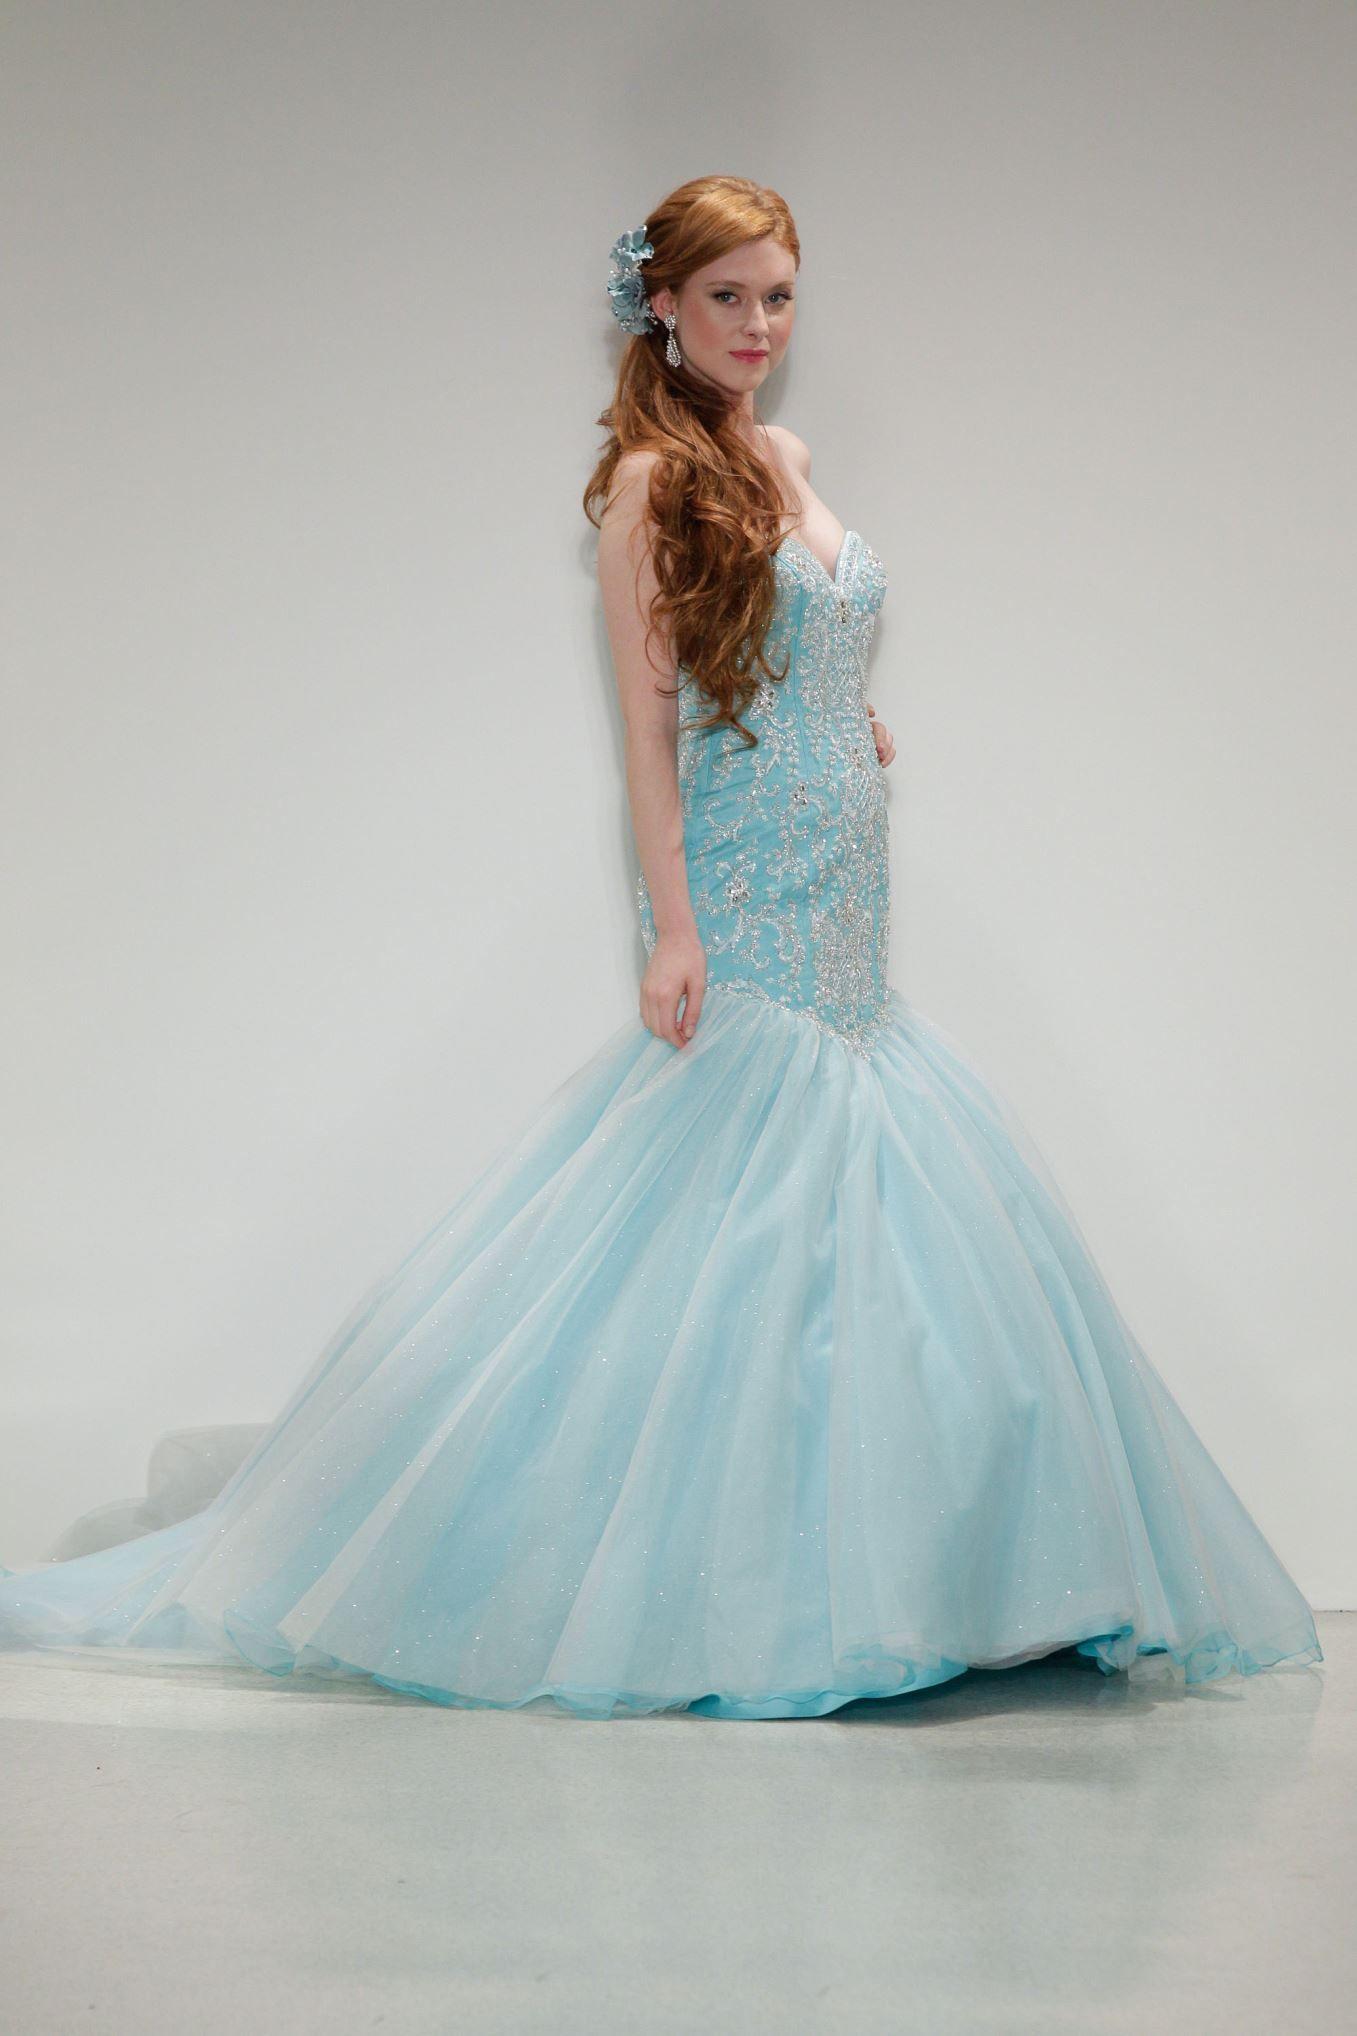 Wedding dresses inspired by Disney princesses | wedding dresses ...